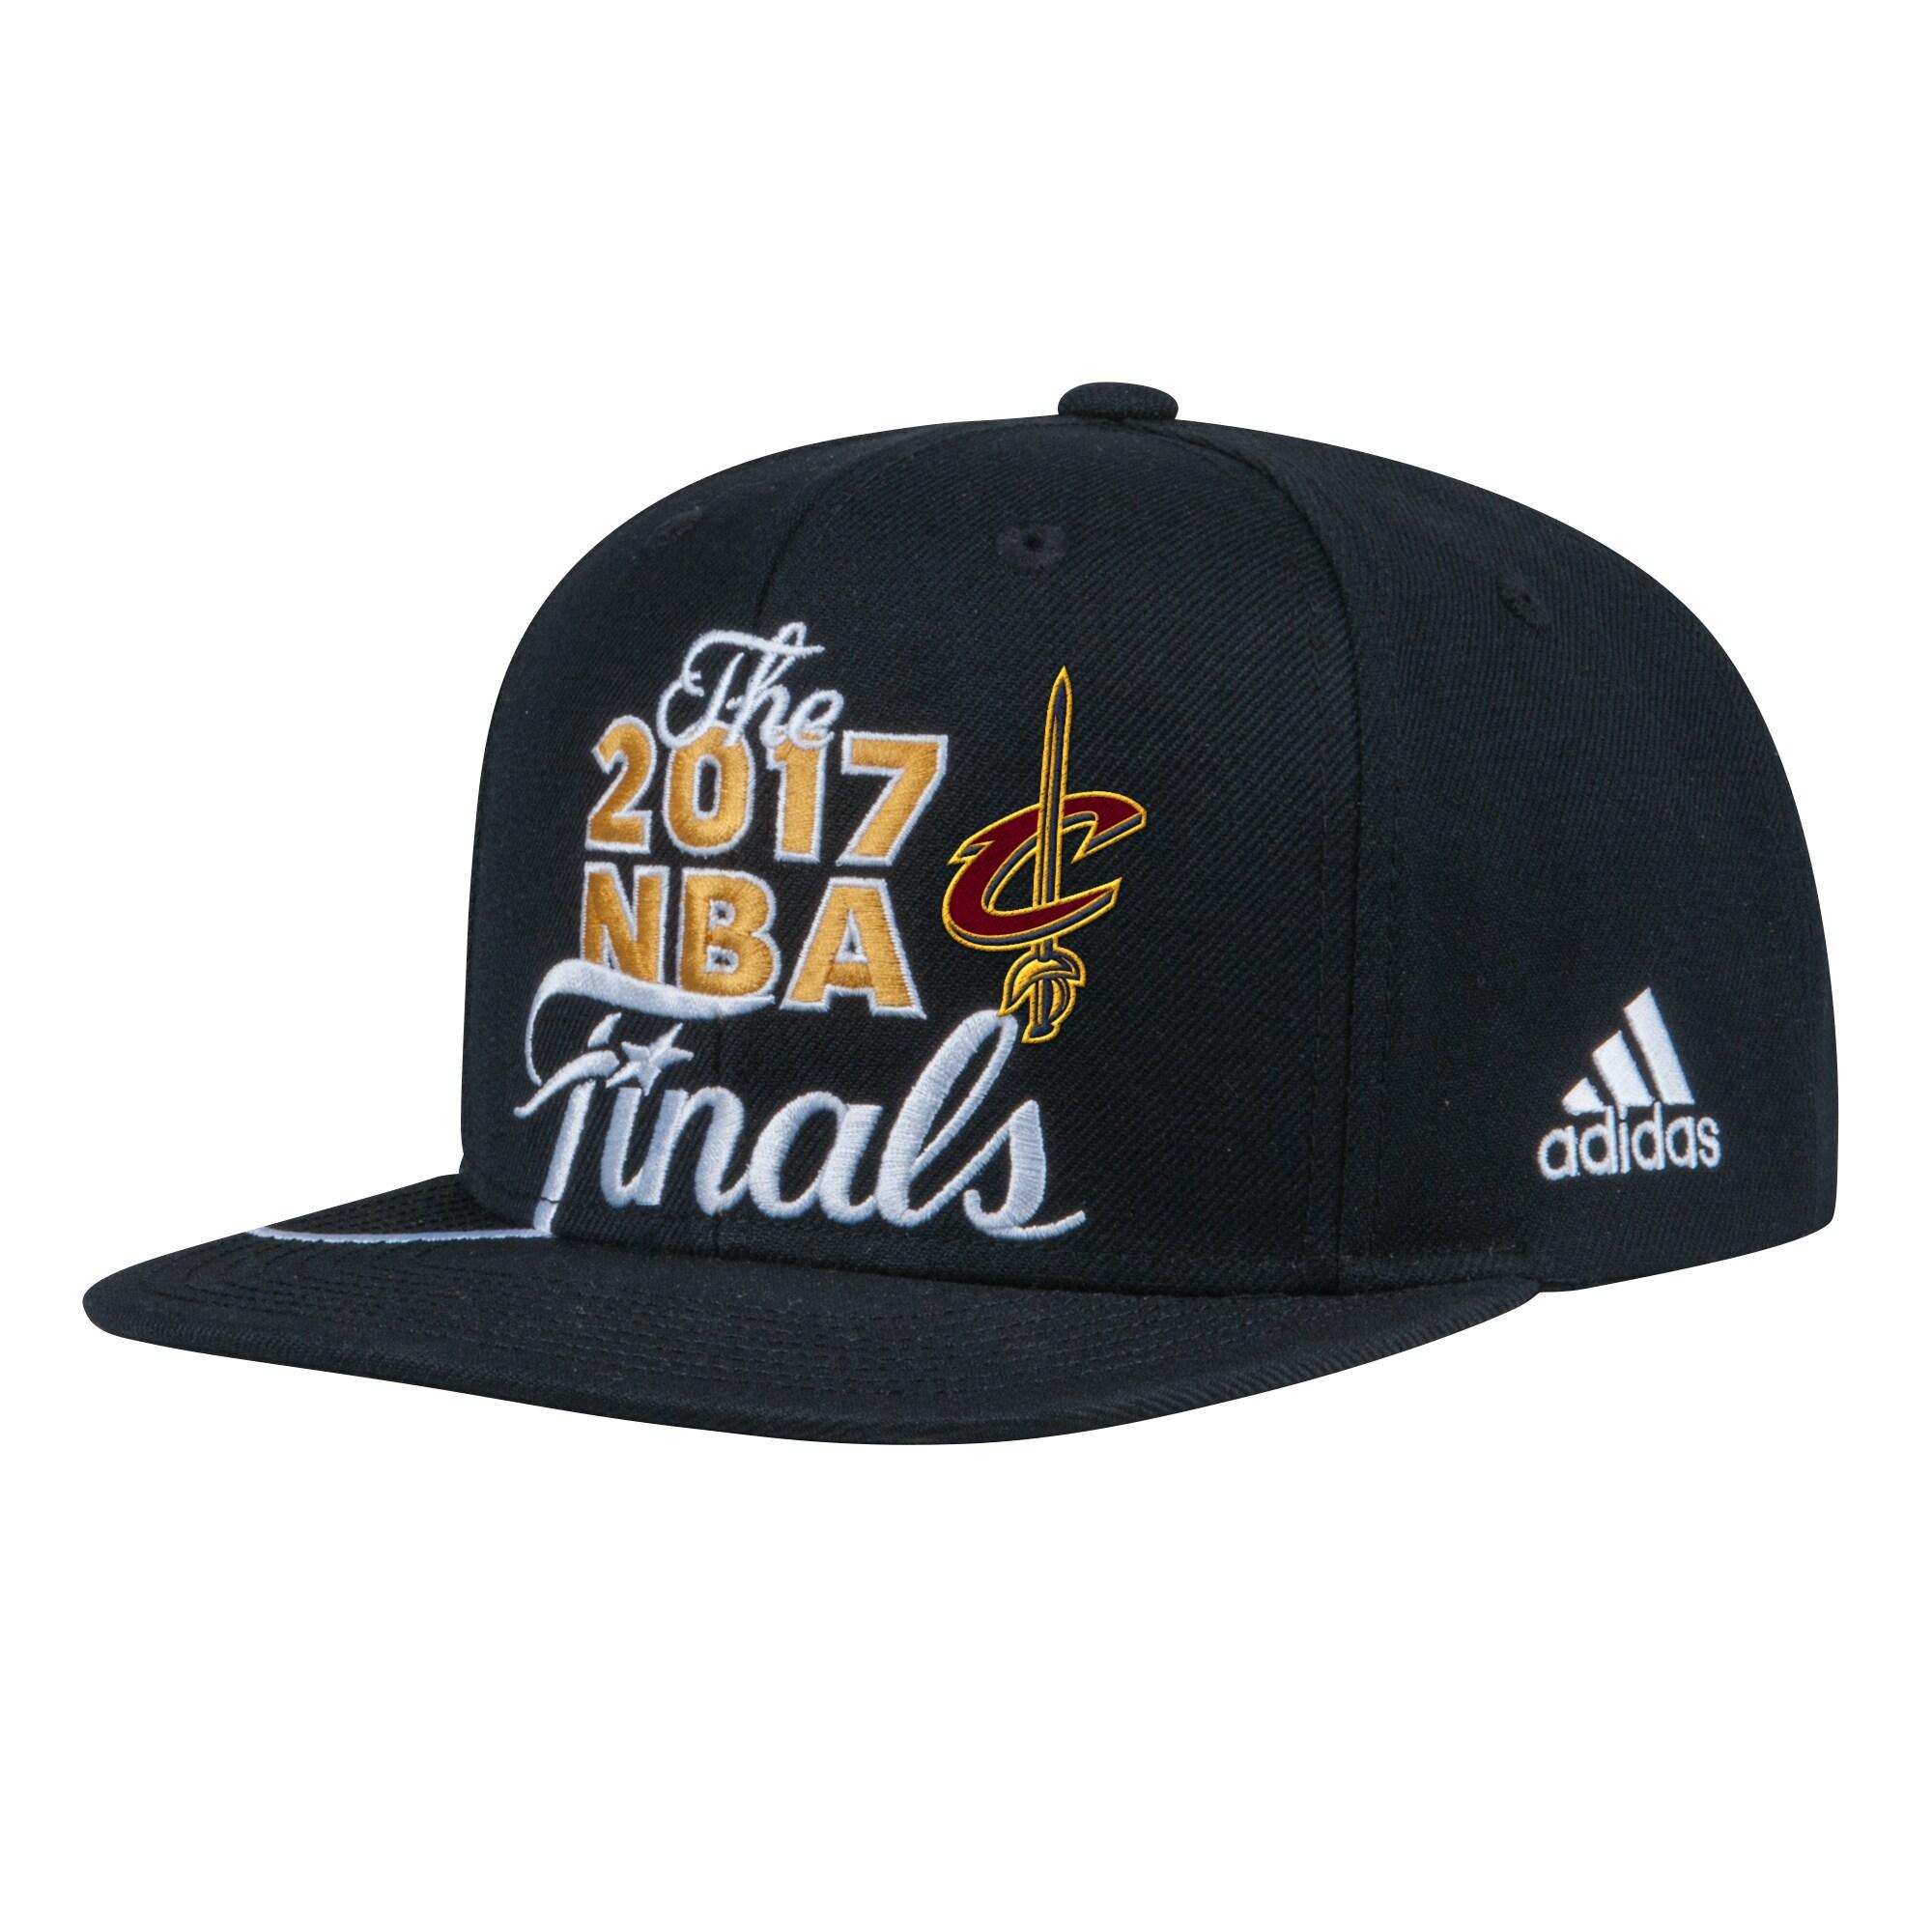 Cleveland Cavaliers adidas 2017 Eastern Conference Champions Locker Room Snapback Adjustable Hat - Black